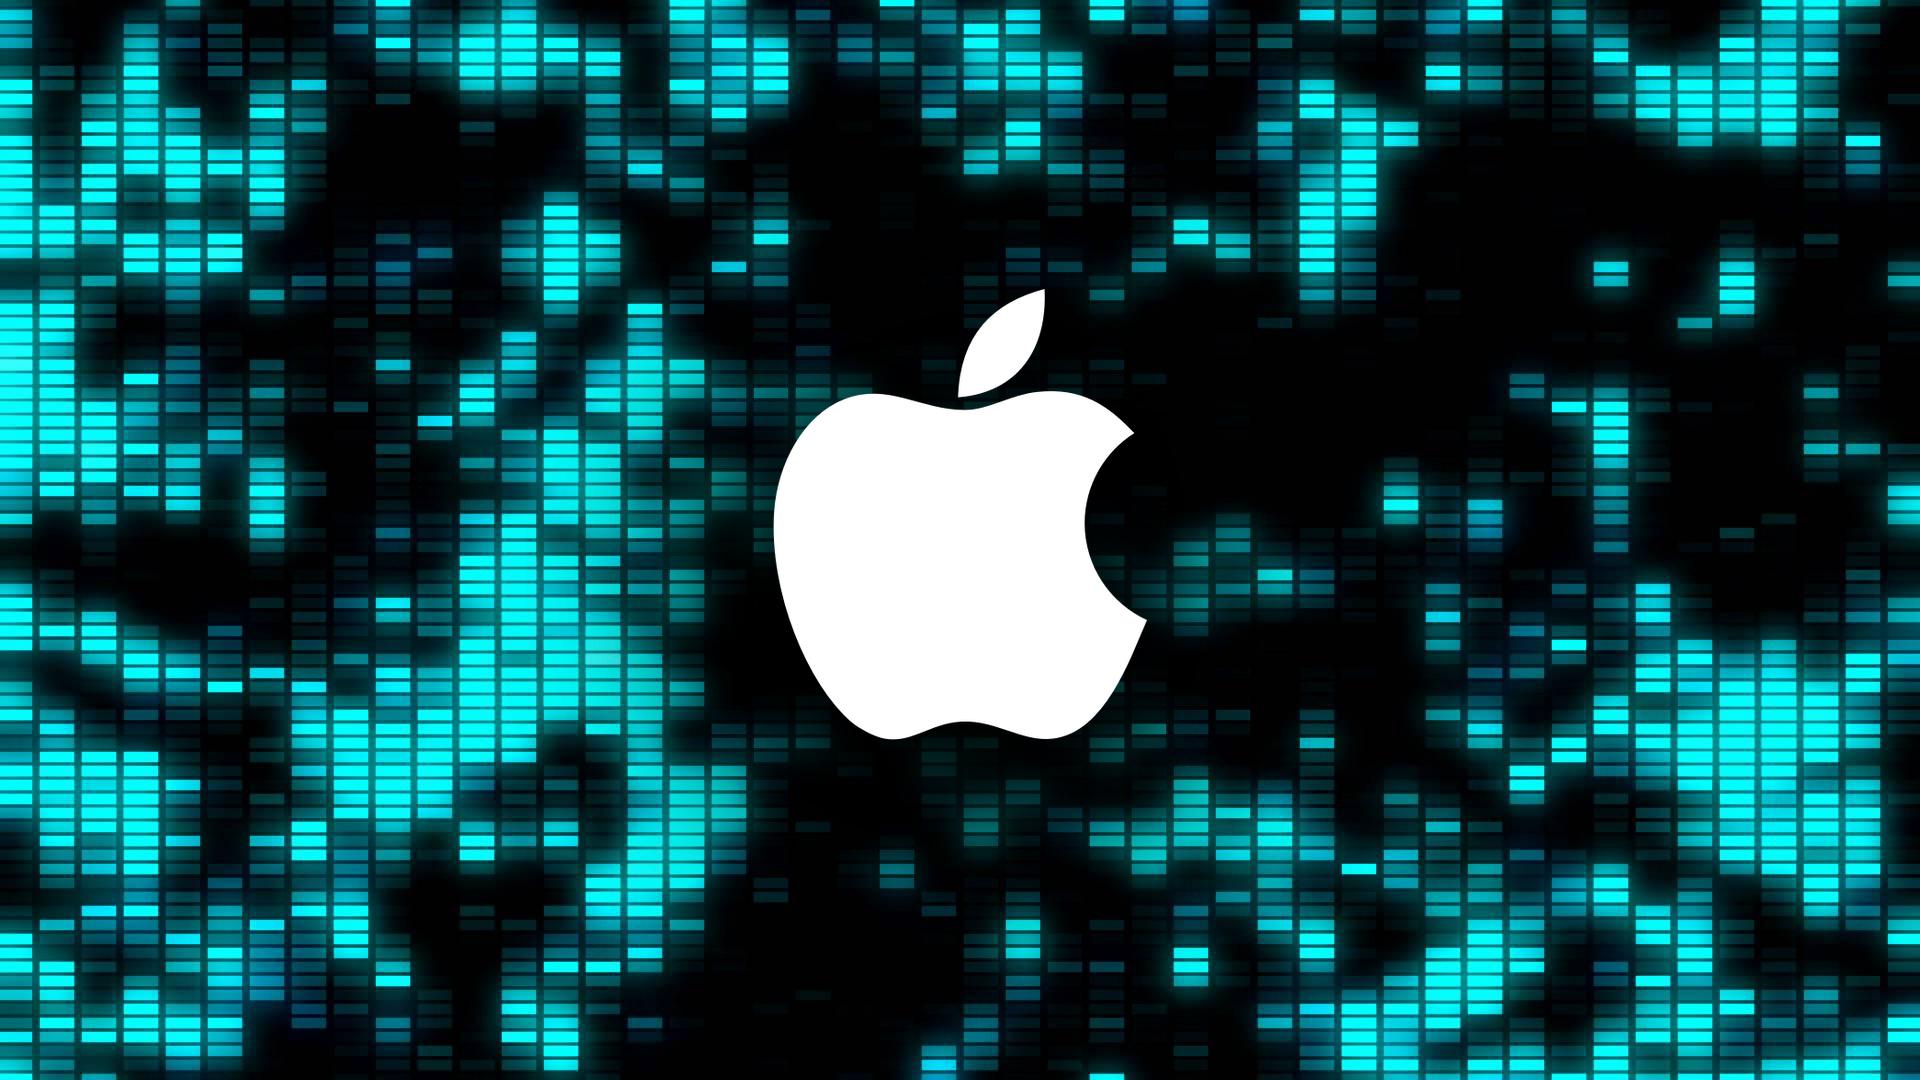 Apple gaming 16x9